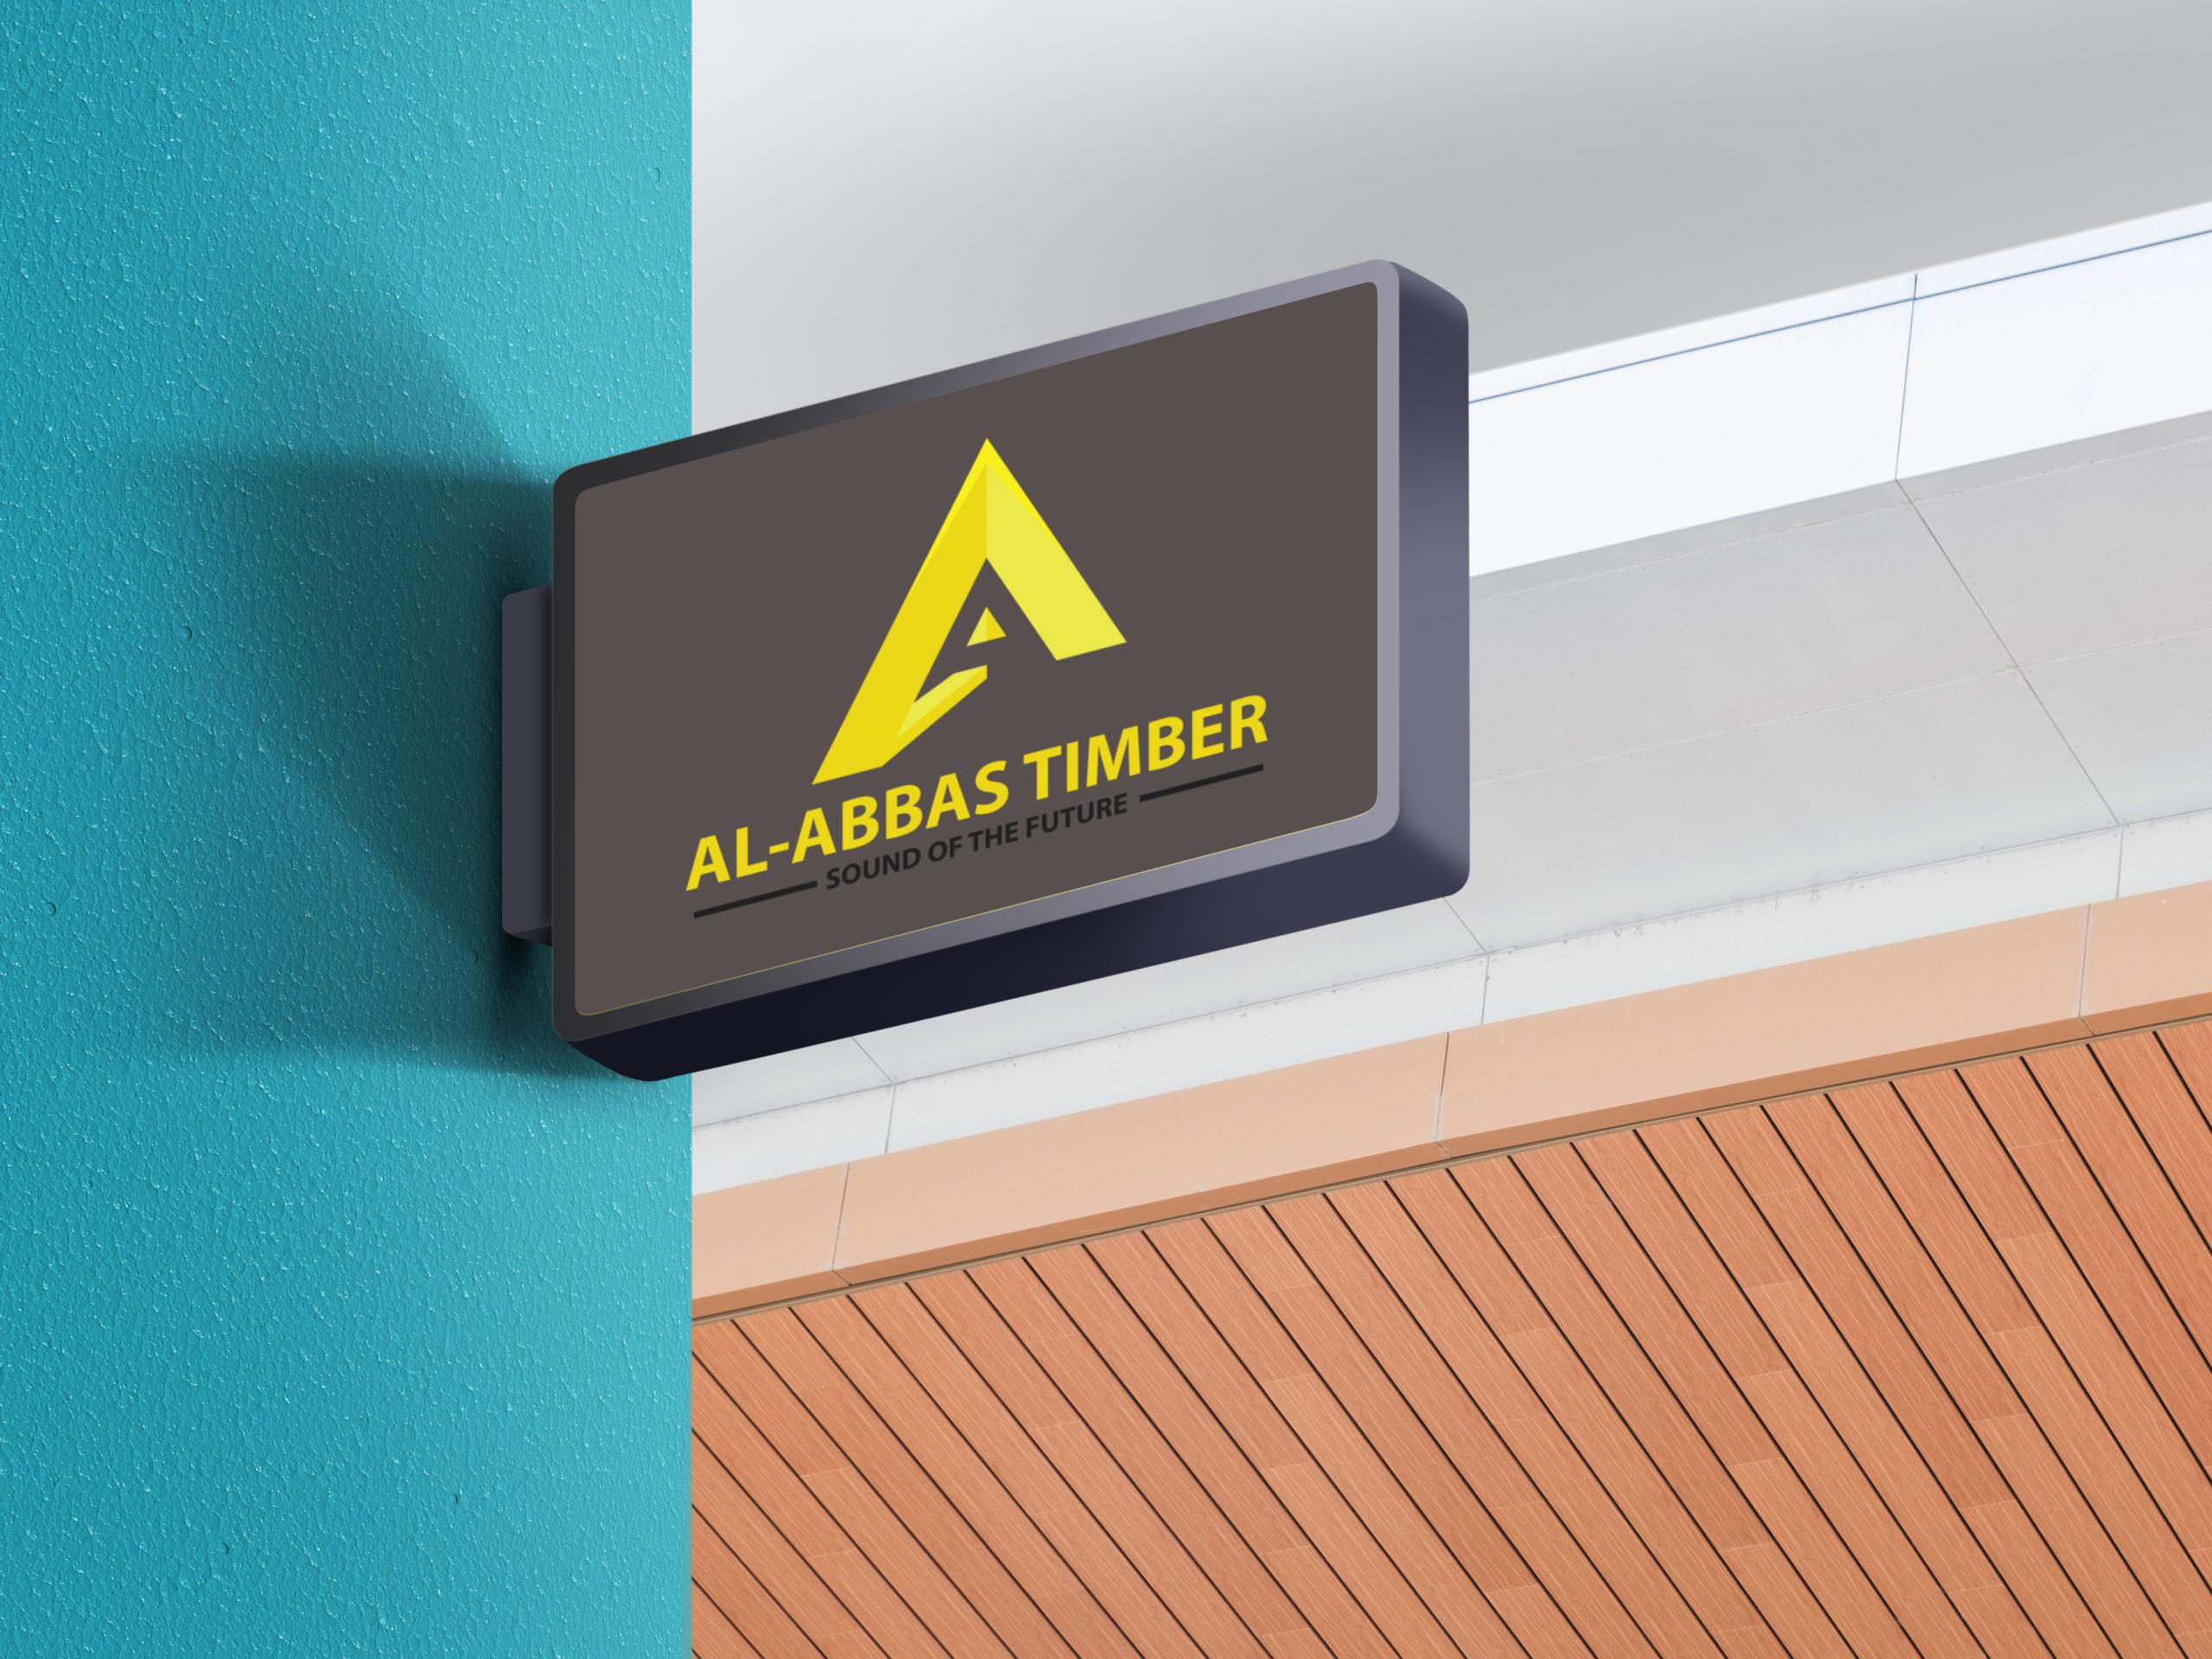 Al Abbas timber shop logo design by Badri Design